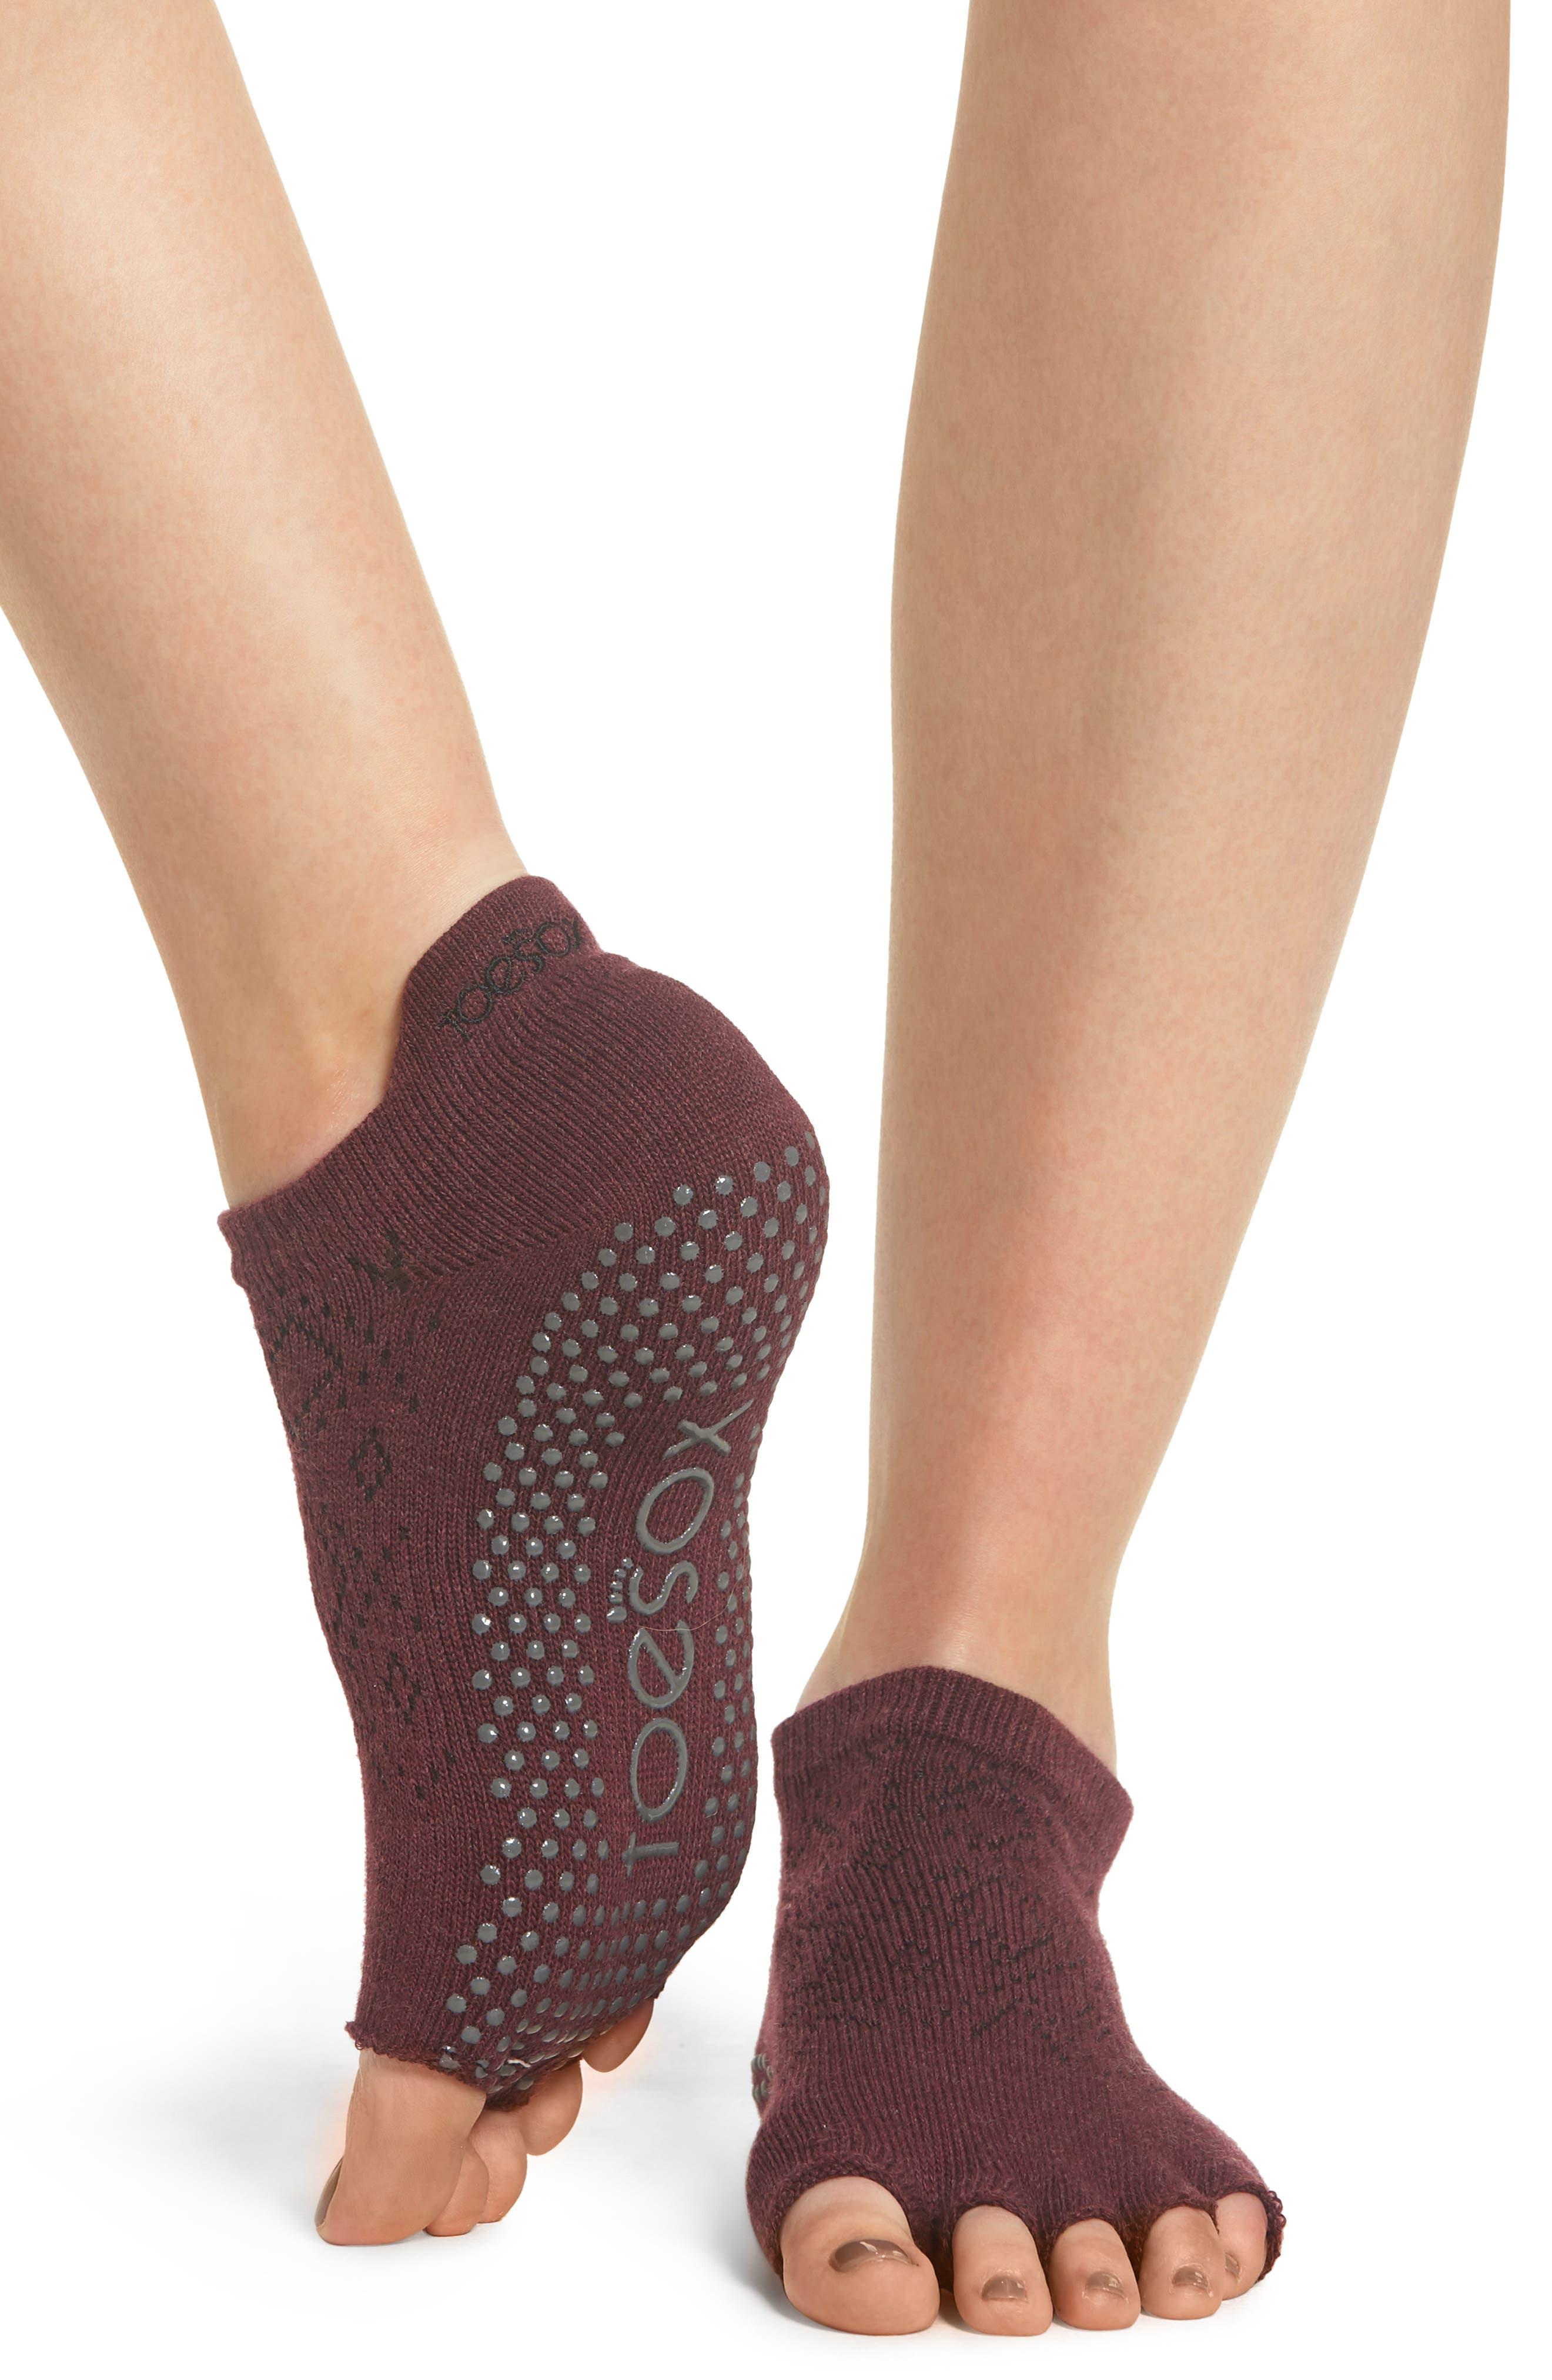 Low Rise Half-Toe Gripper Socks,                             Alternate thumbnail 2, color,                             VIXEN